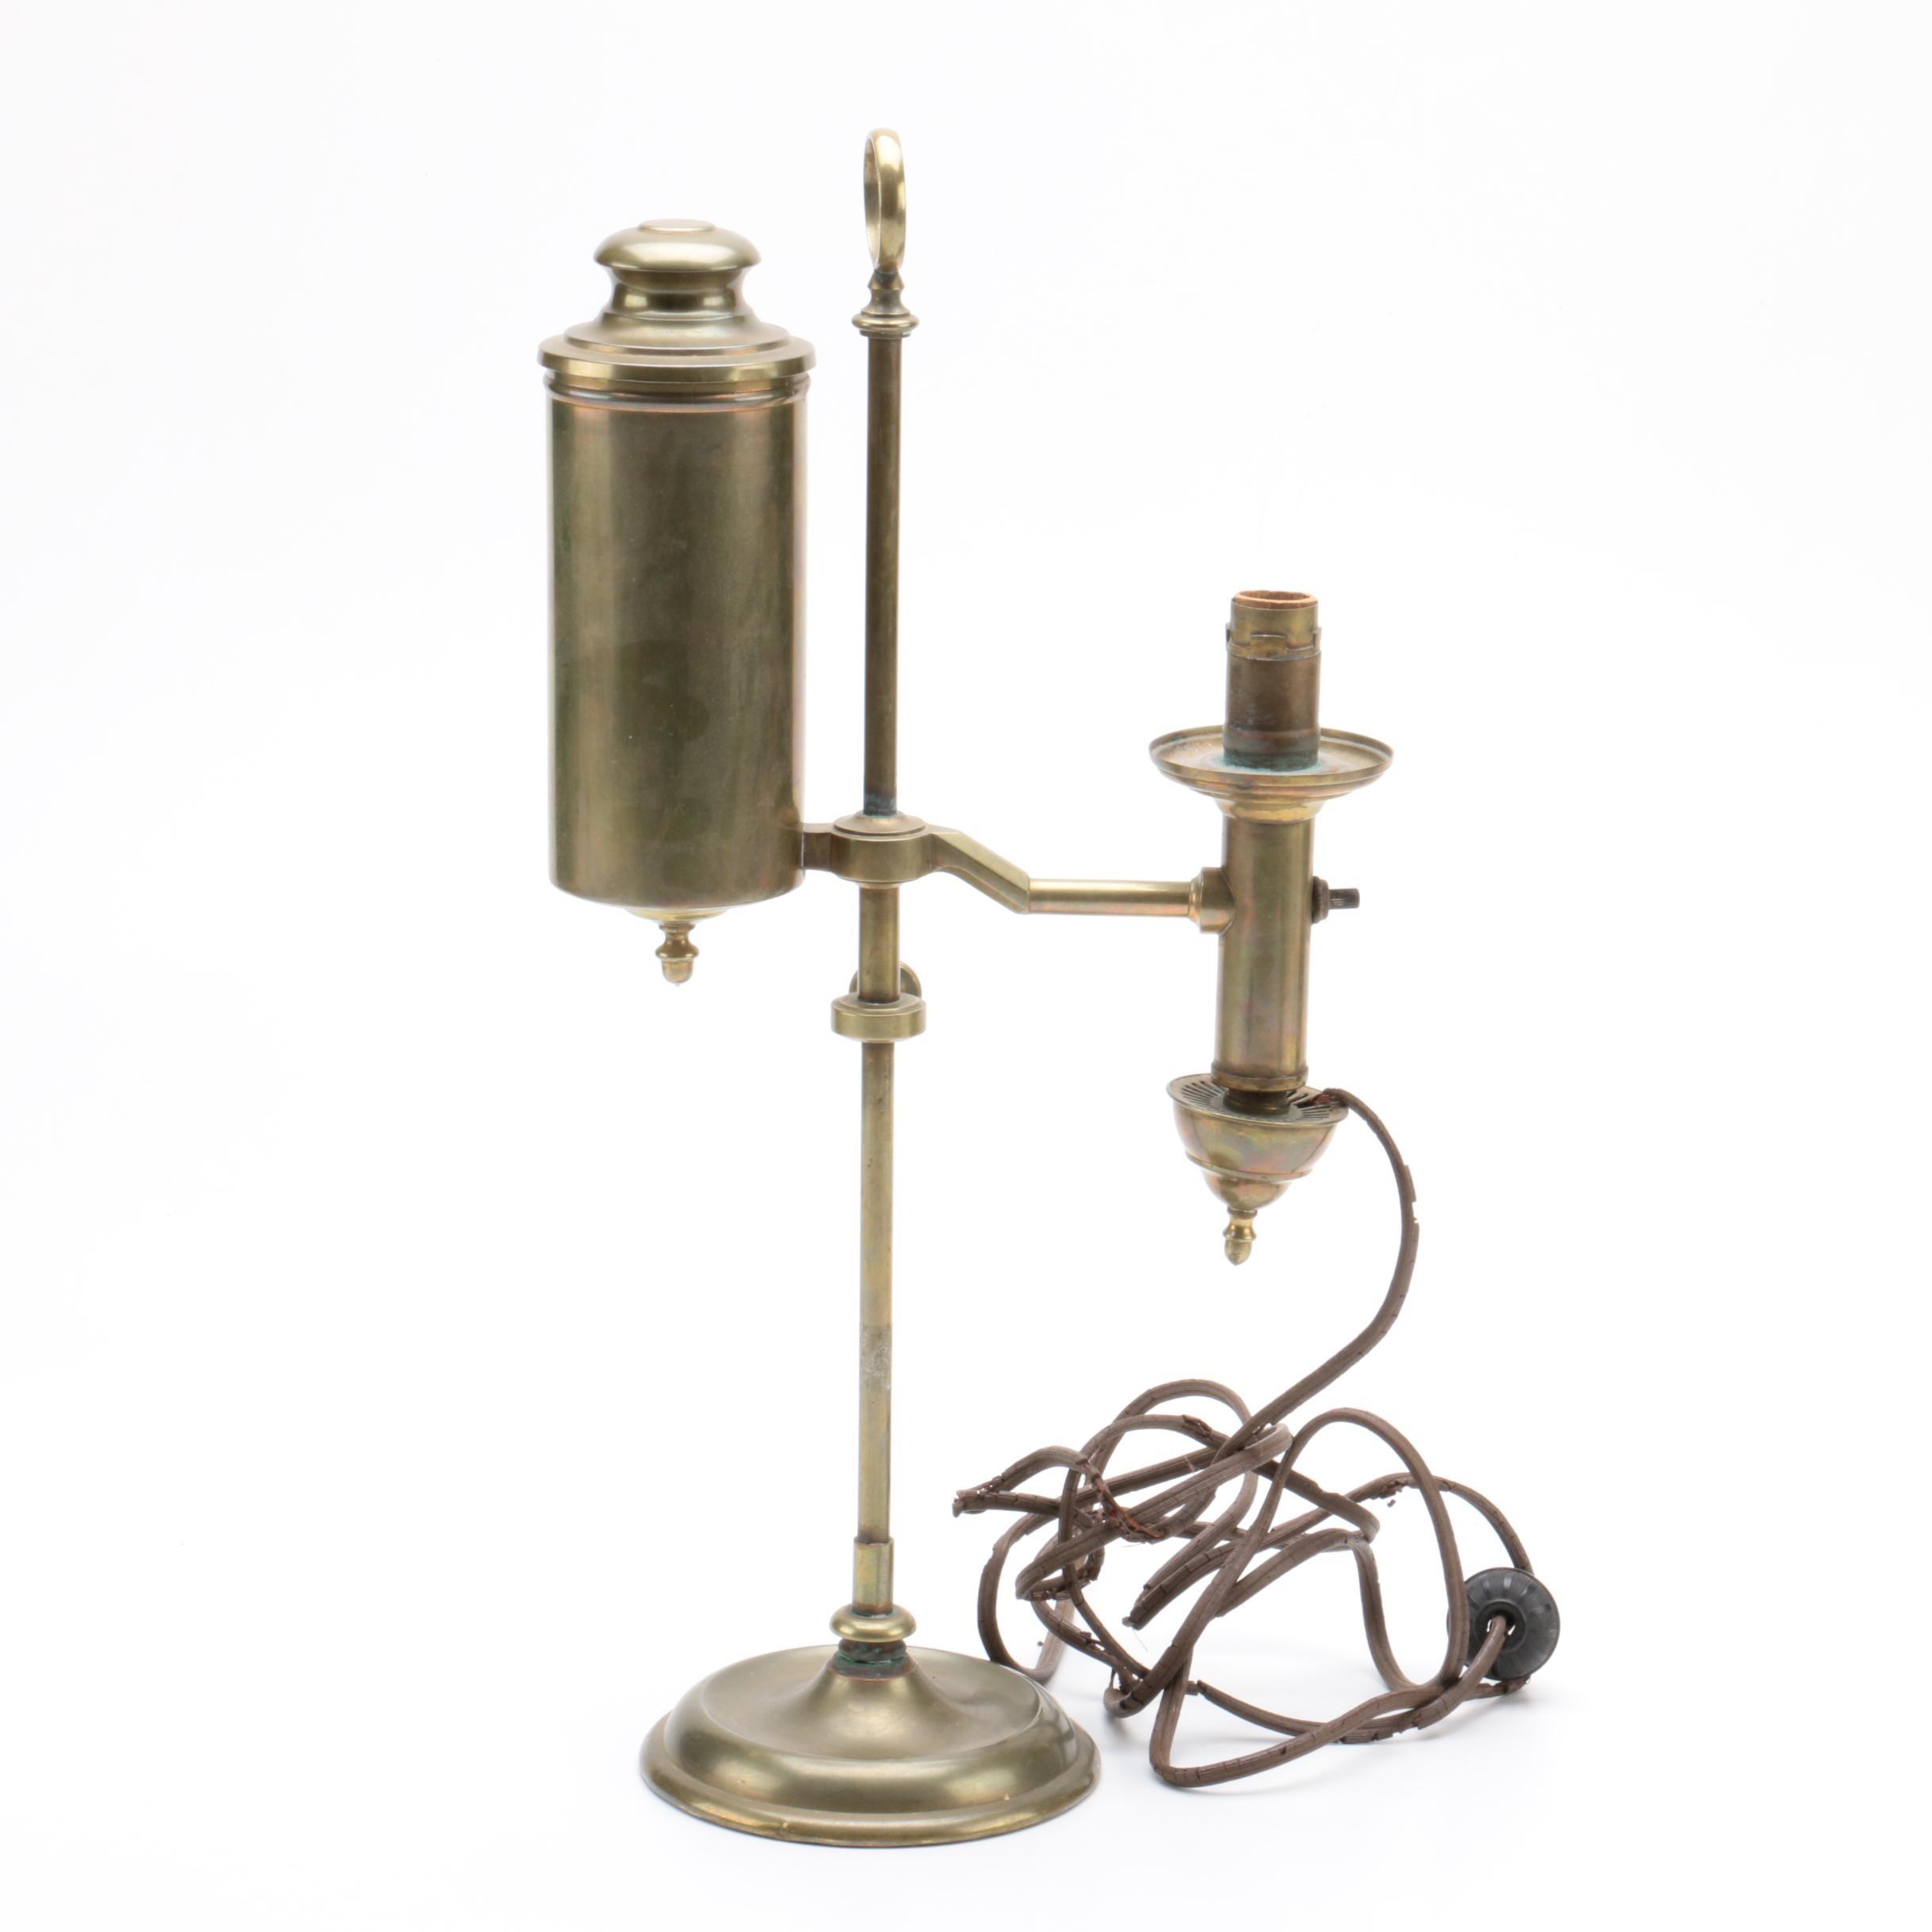 Antique Converted Oil Lamp